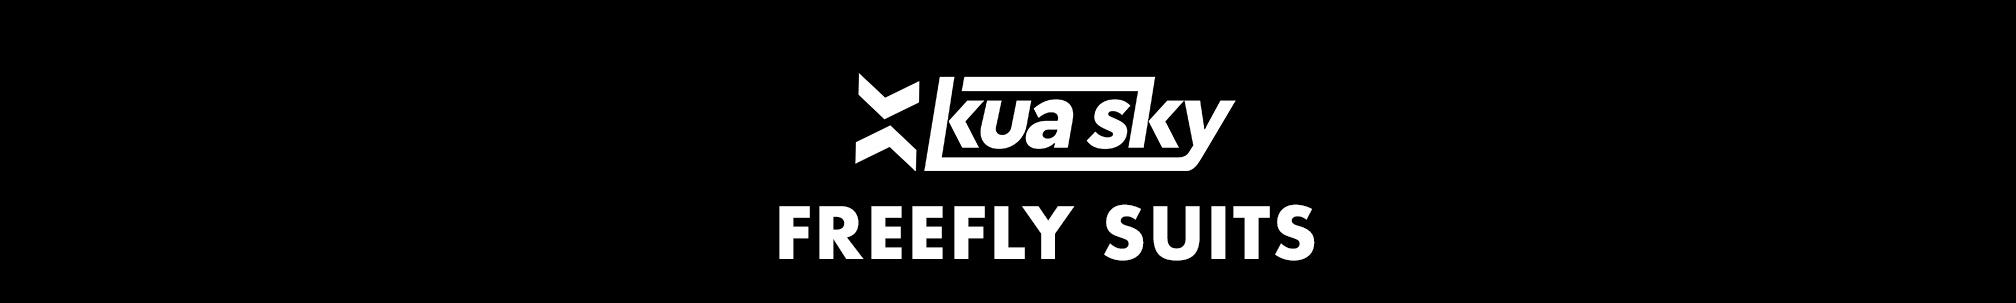 KS Freefly Suits.jpg